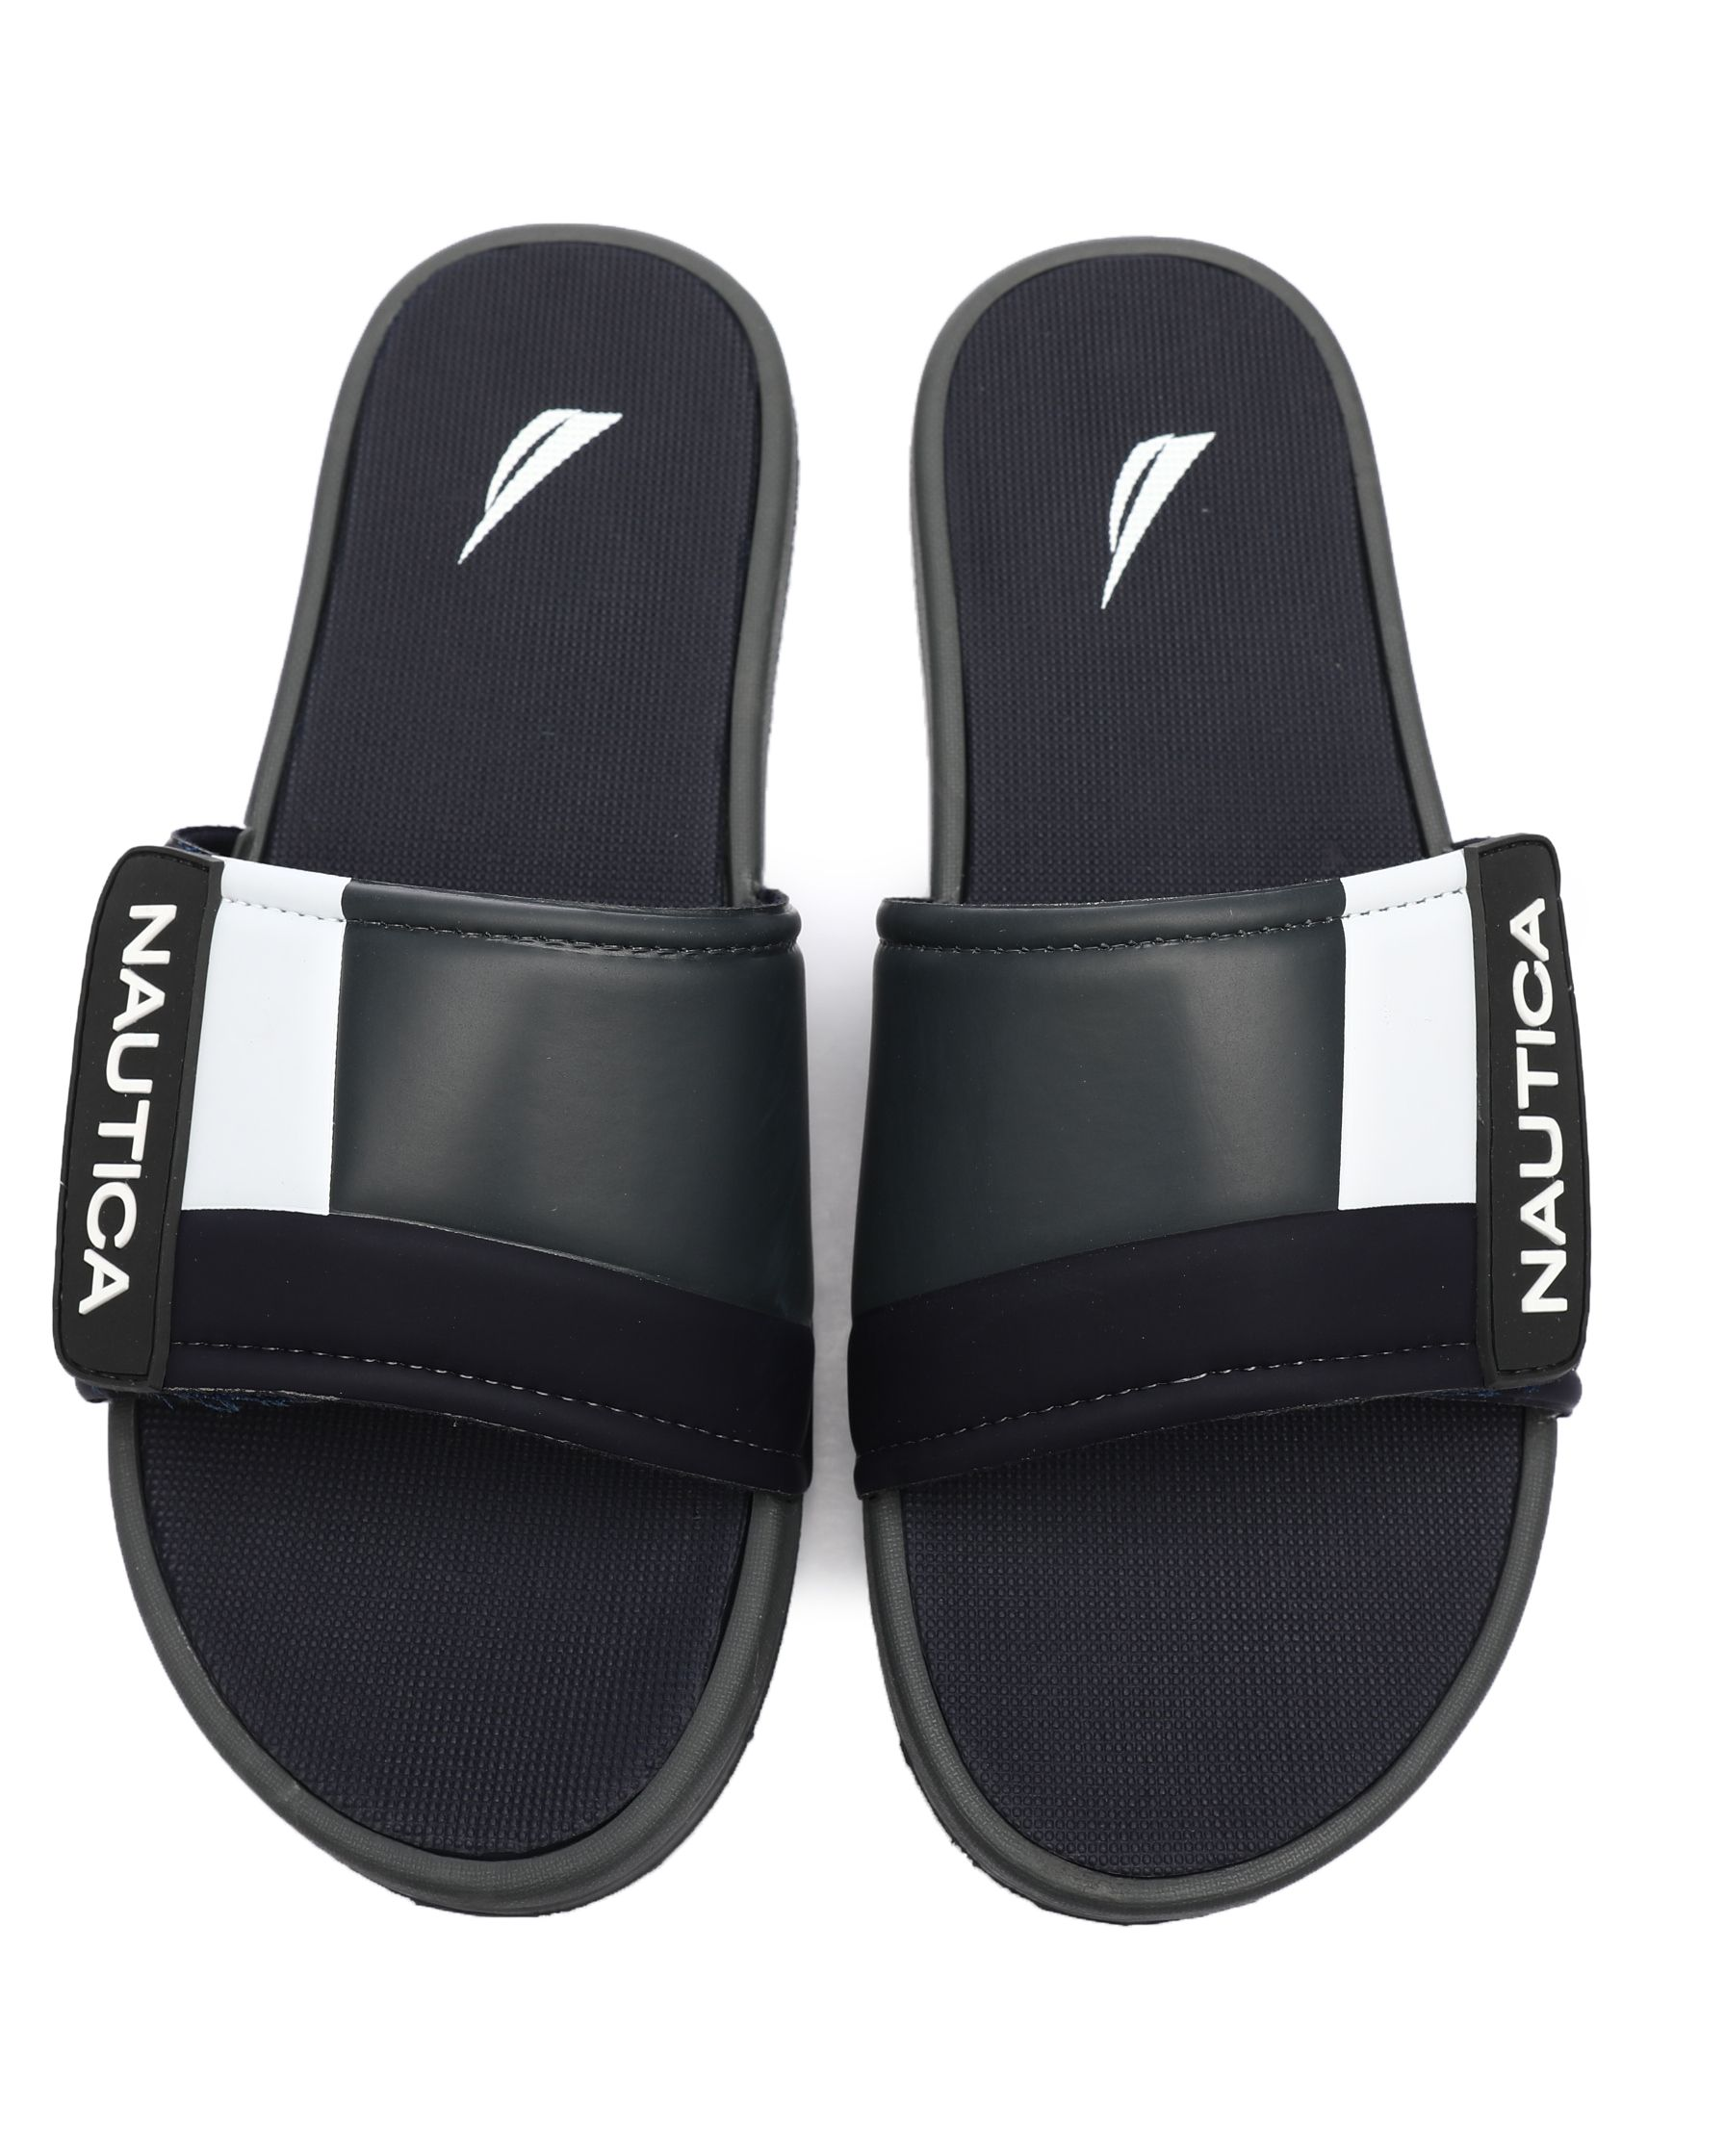 1c420de58e1d Bower Slide Sandals Men s Footwear from Nautica. Find Nautica fashion    more at DrJays.com